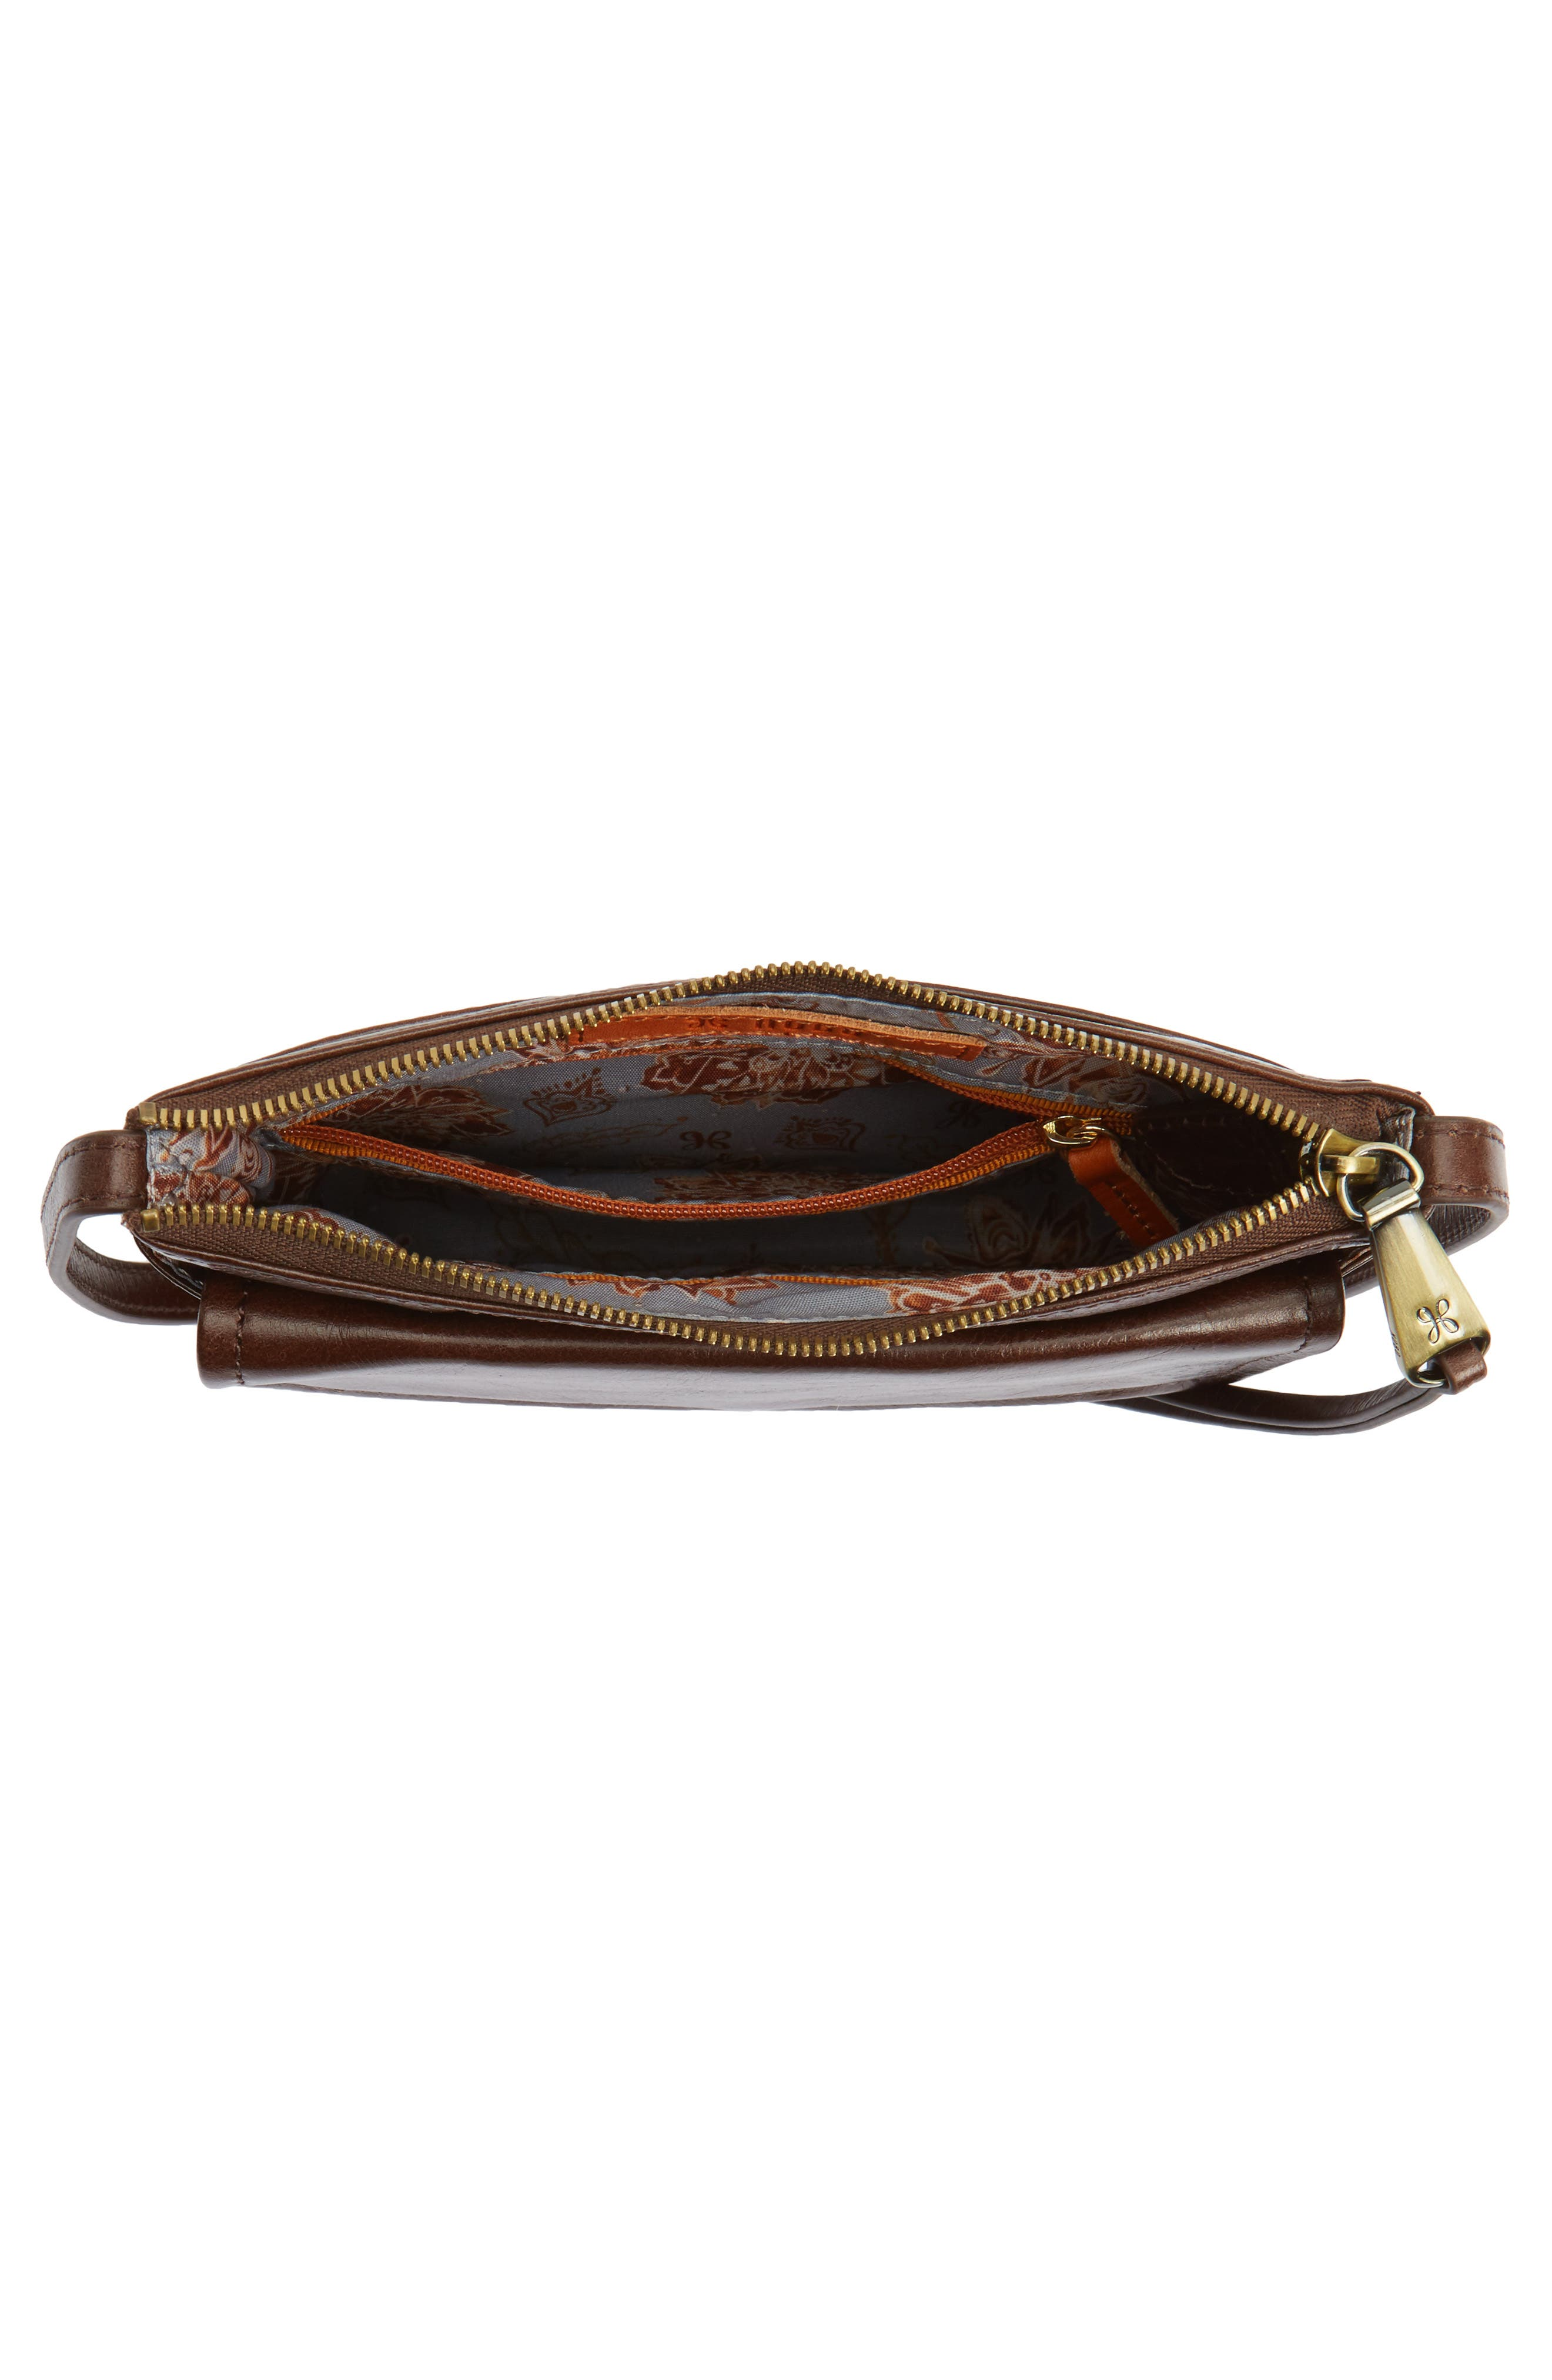 Amble Leather Crossbody Bag,                             Alternate thumbnail 41, color,